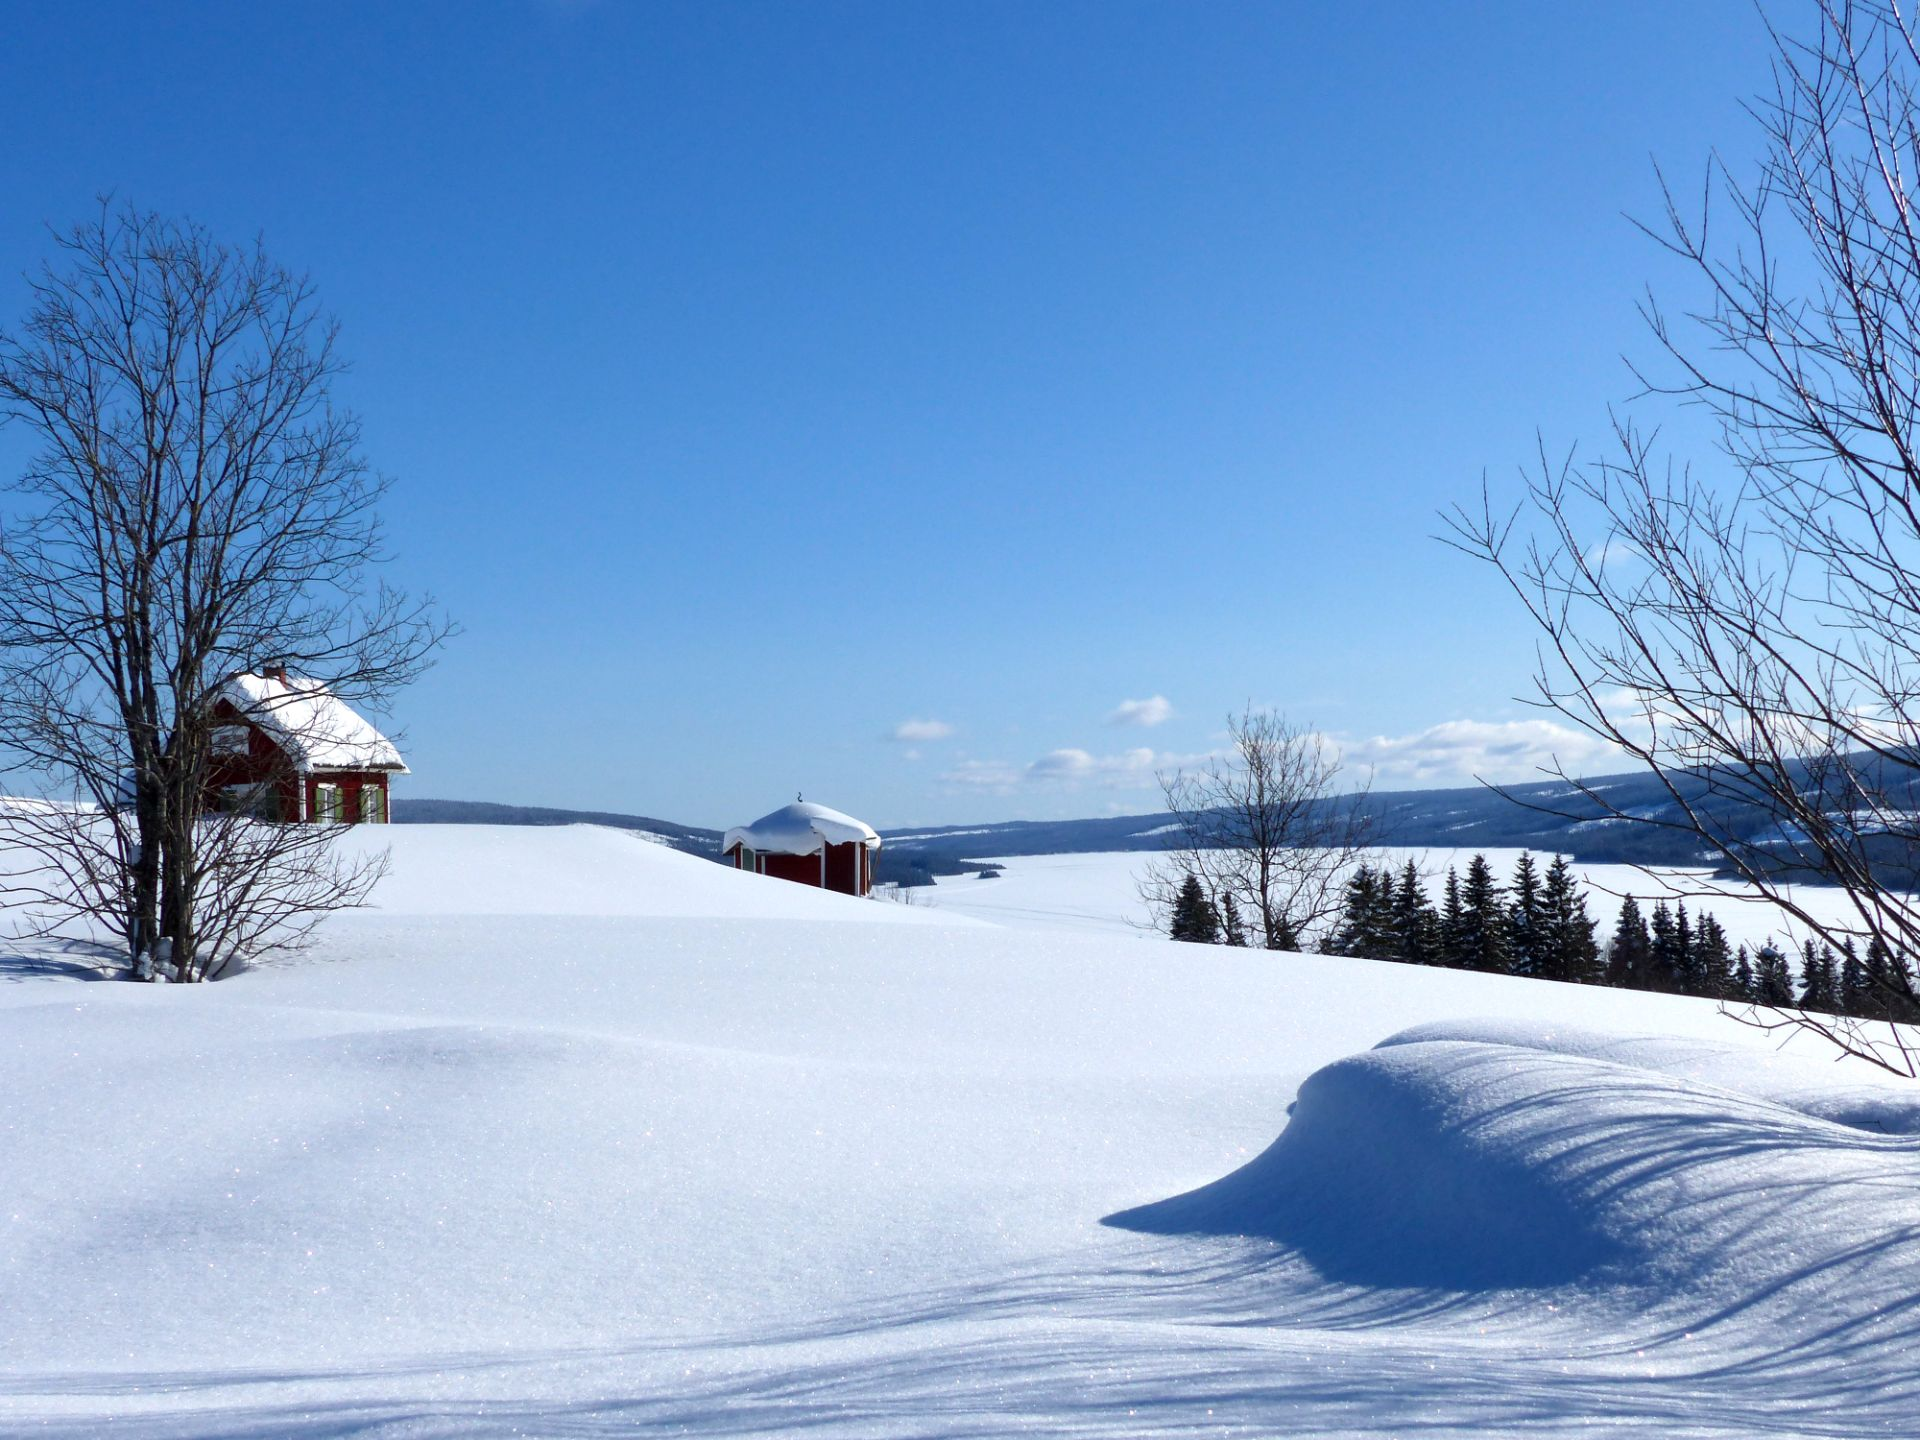 Vinteridyll i Övre Åkersjön. Foto © Rut Magnusson